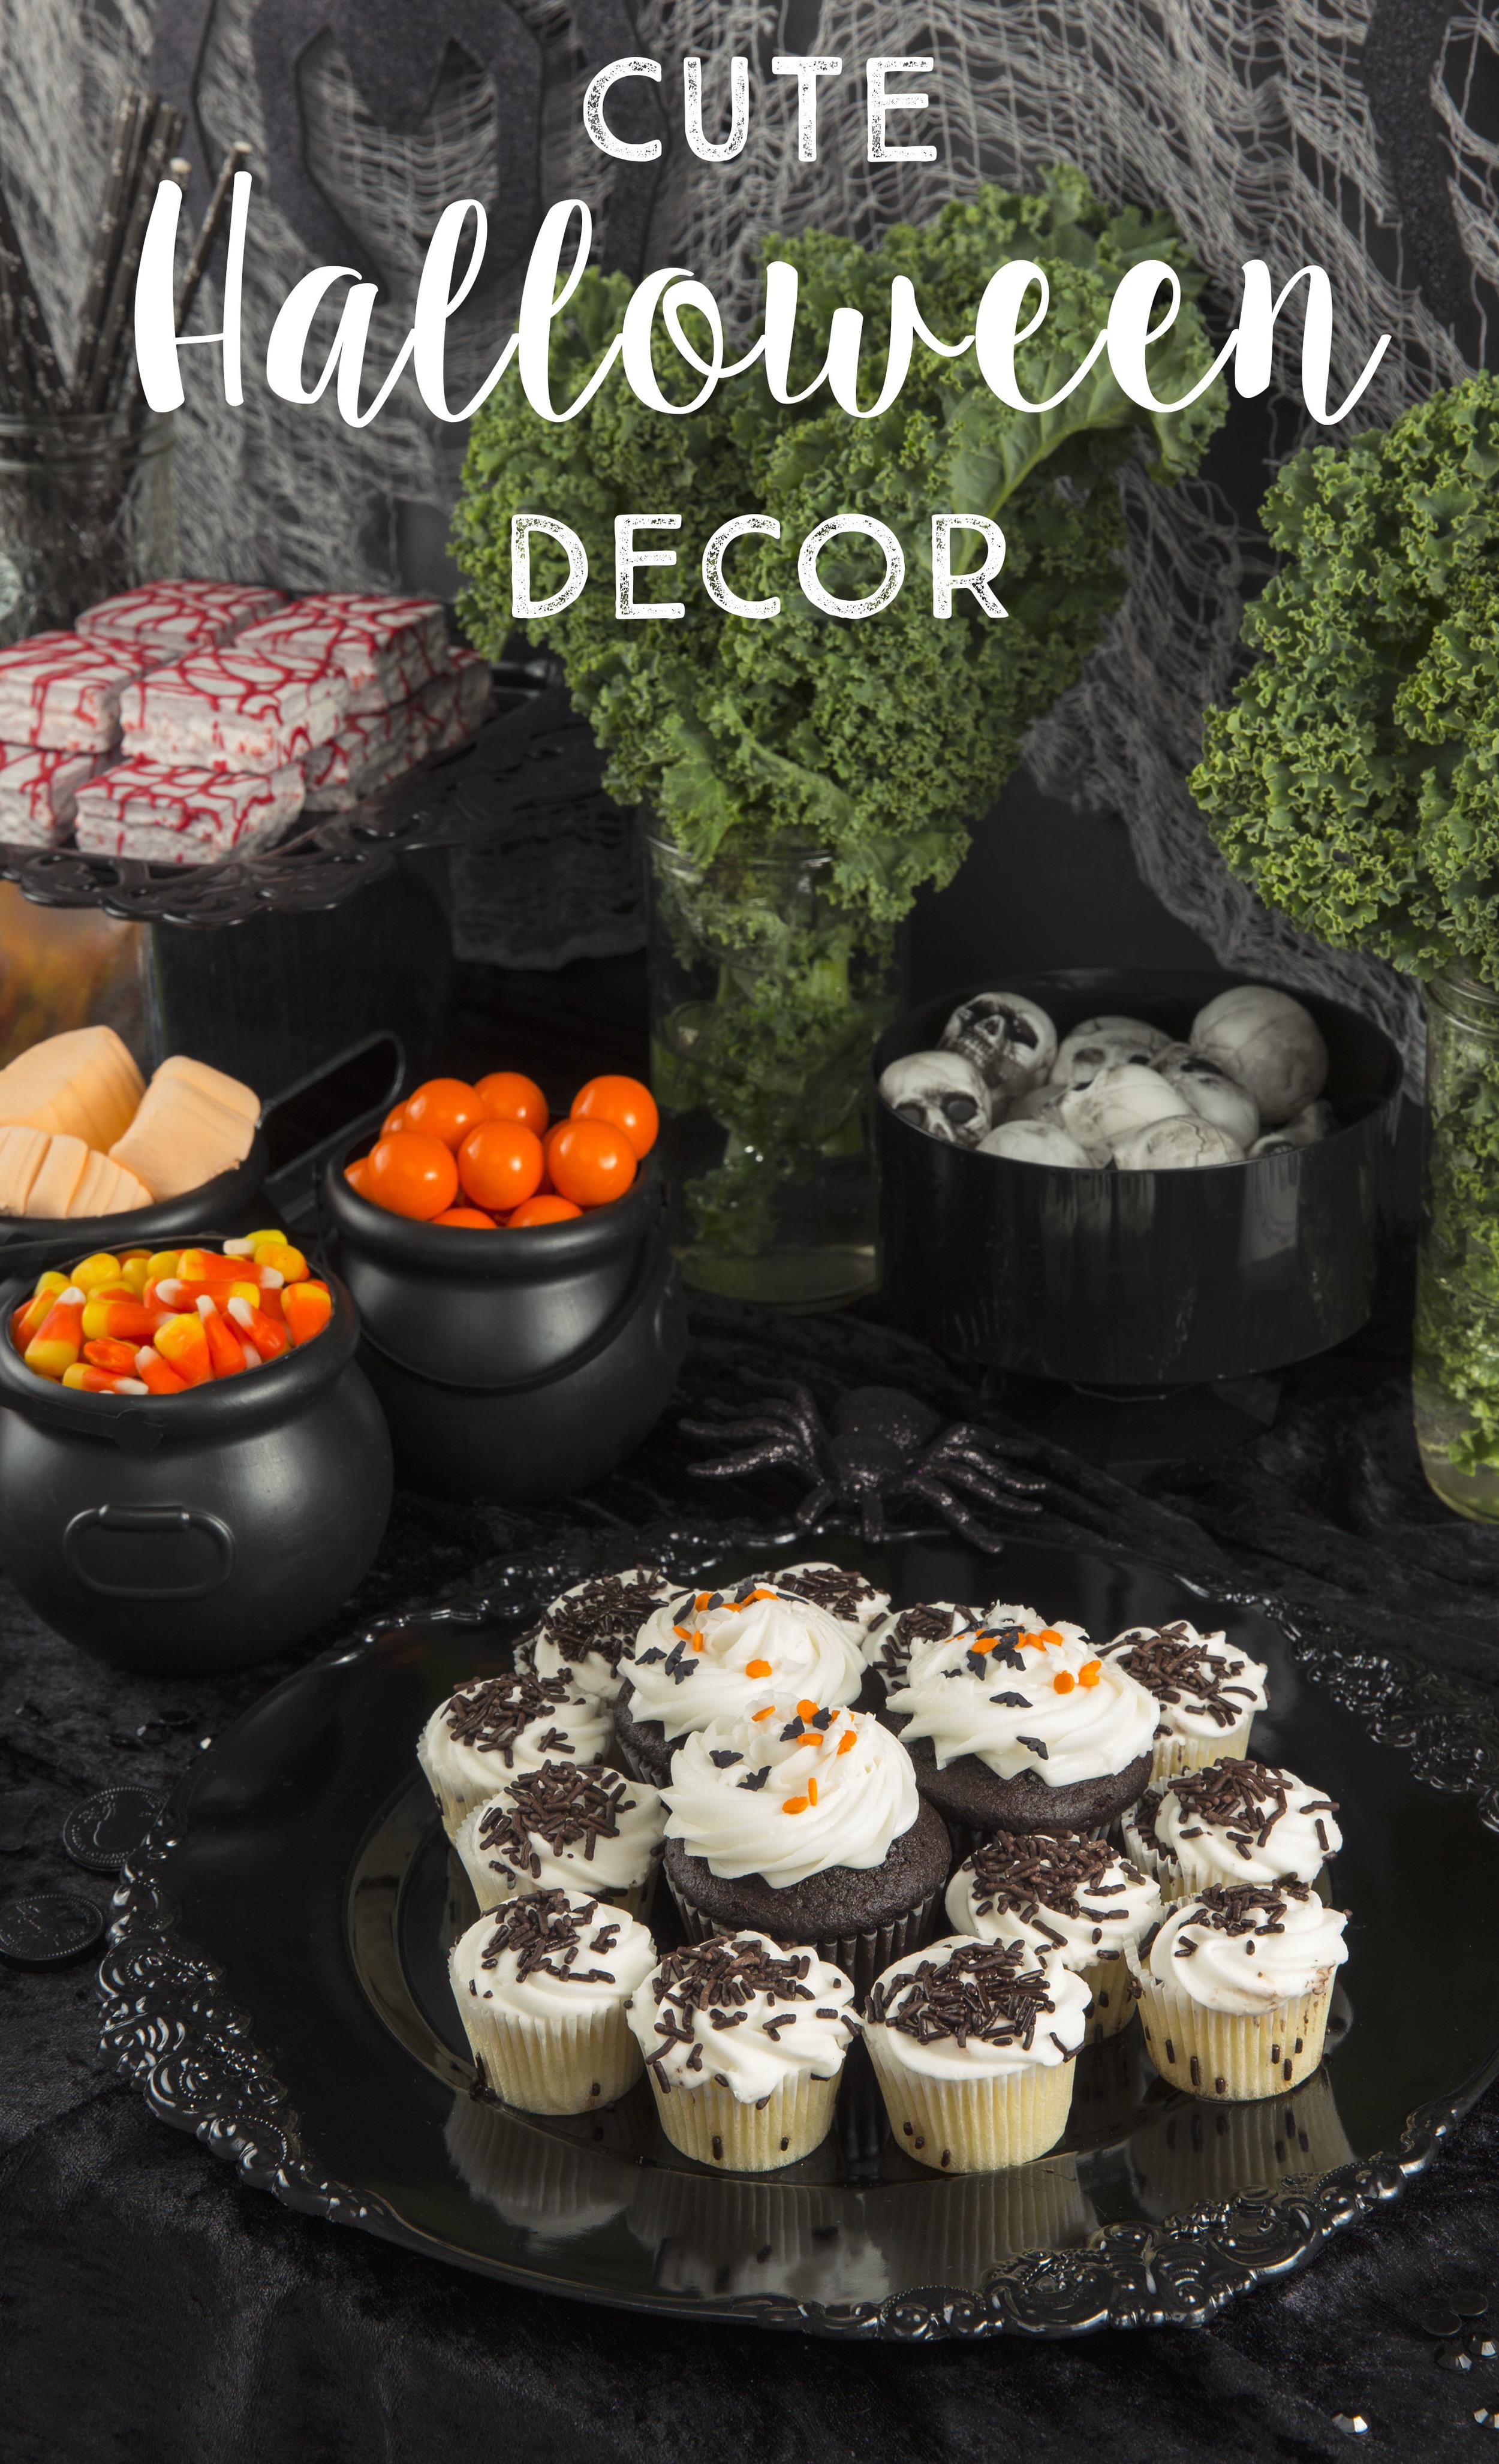 Cute Halloween Party Decor Idea